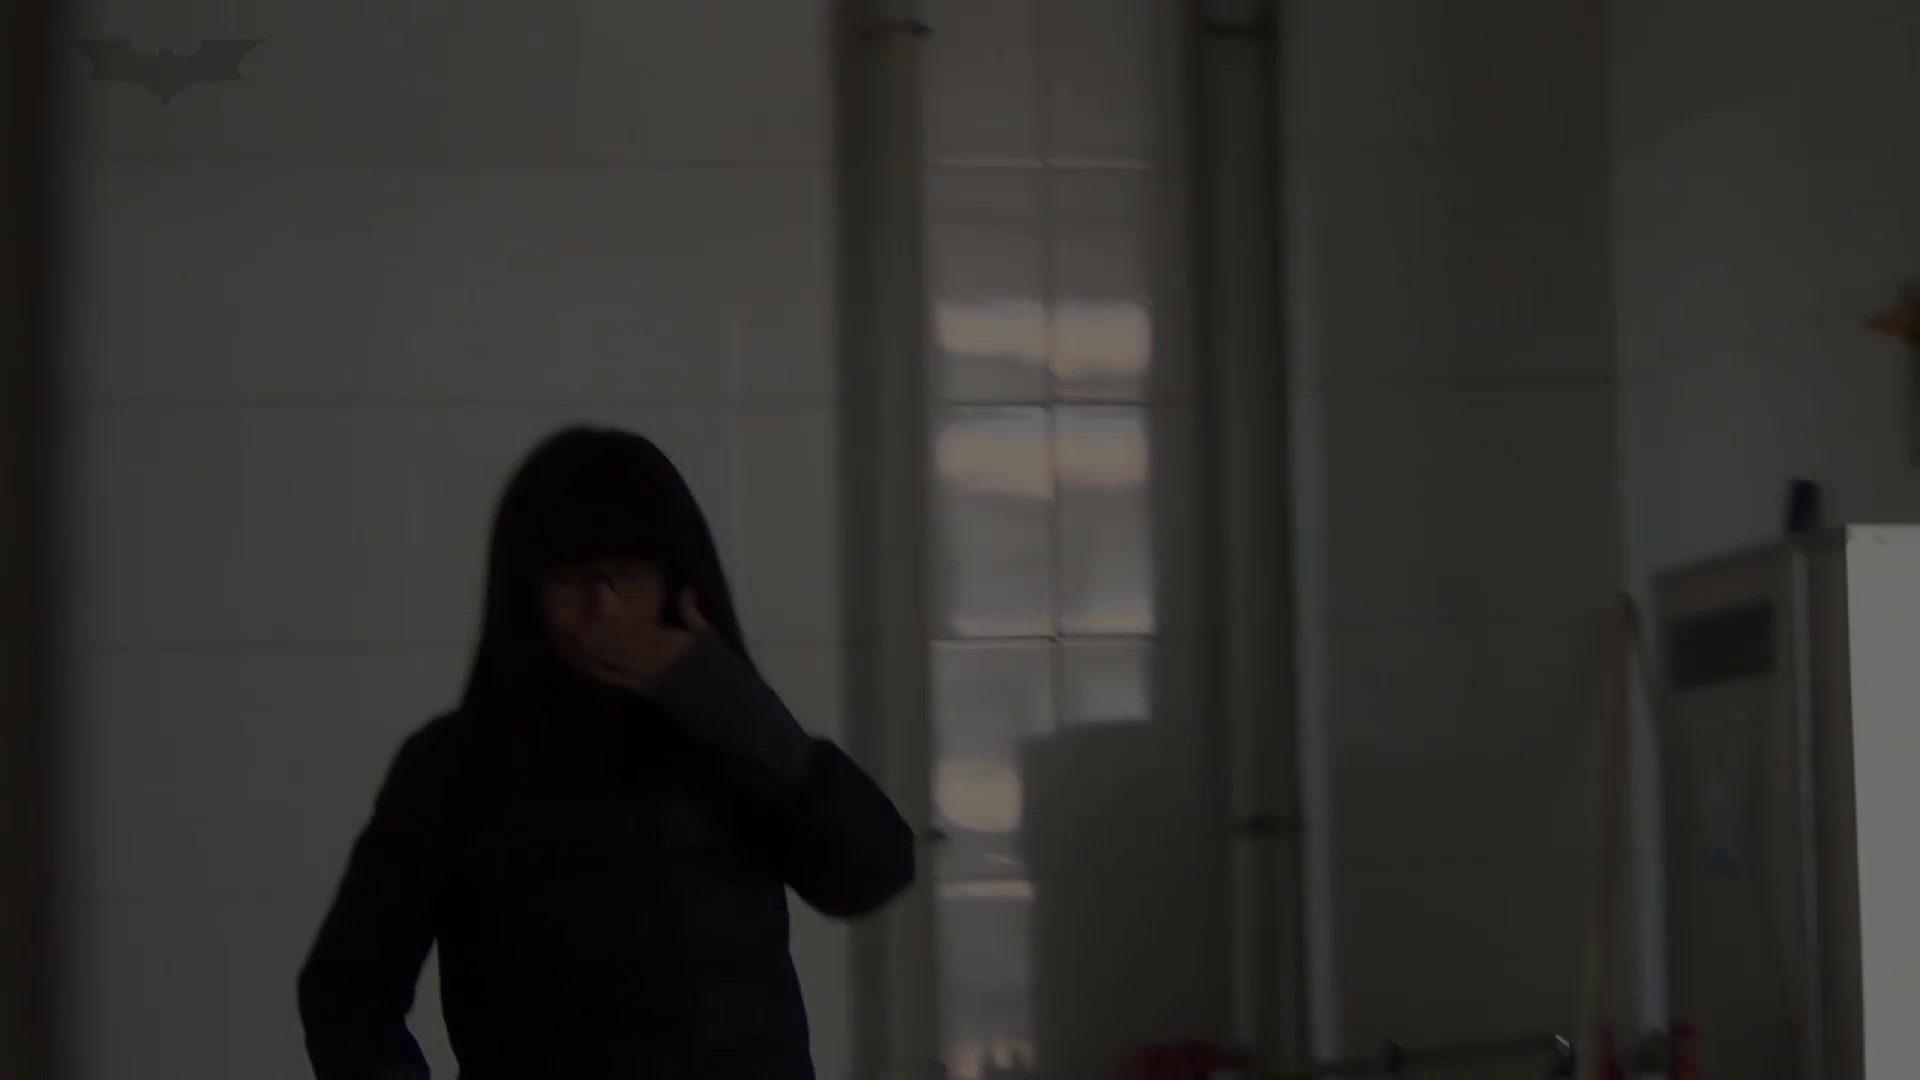 JD盗撮 美女の洗面所の秘密 Vol.35 美女 ワレメ無修正動画無料 75pic 64